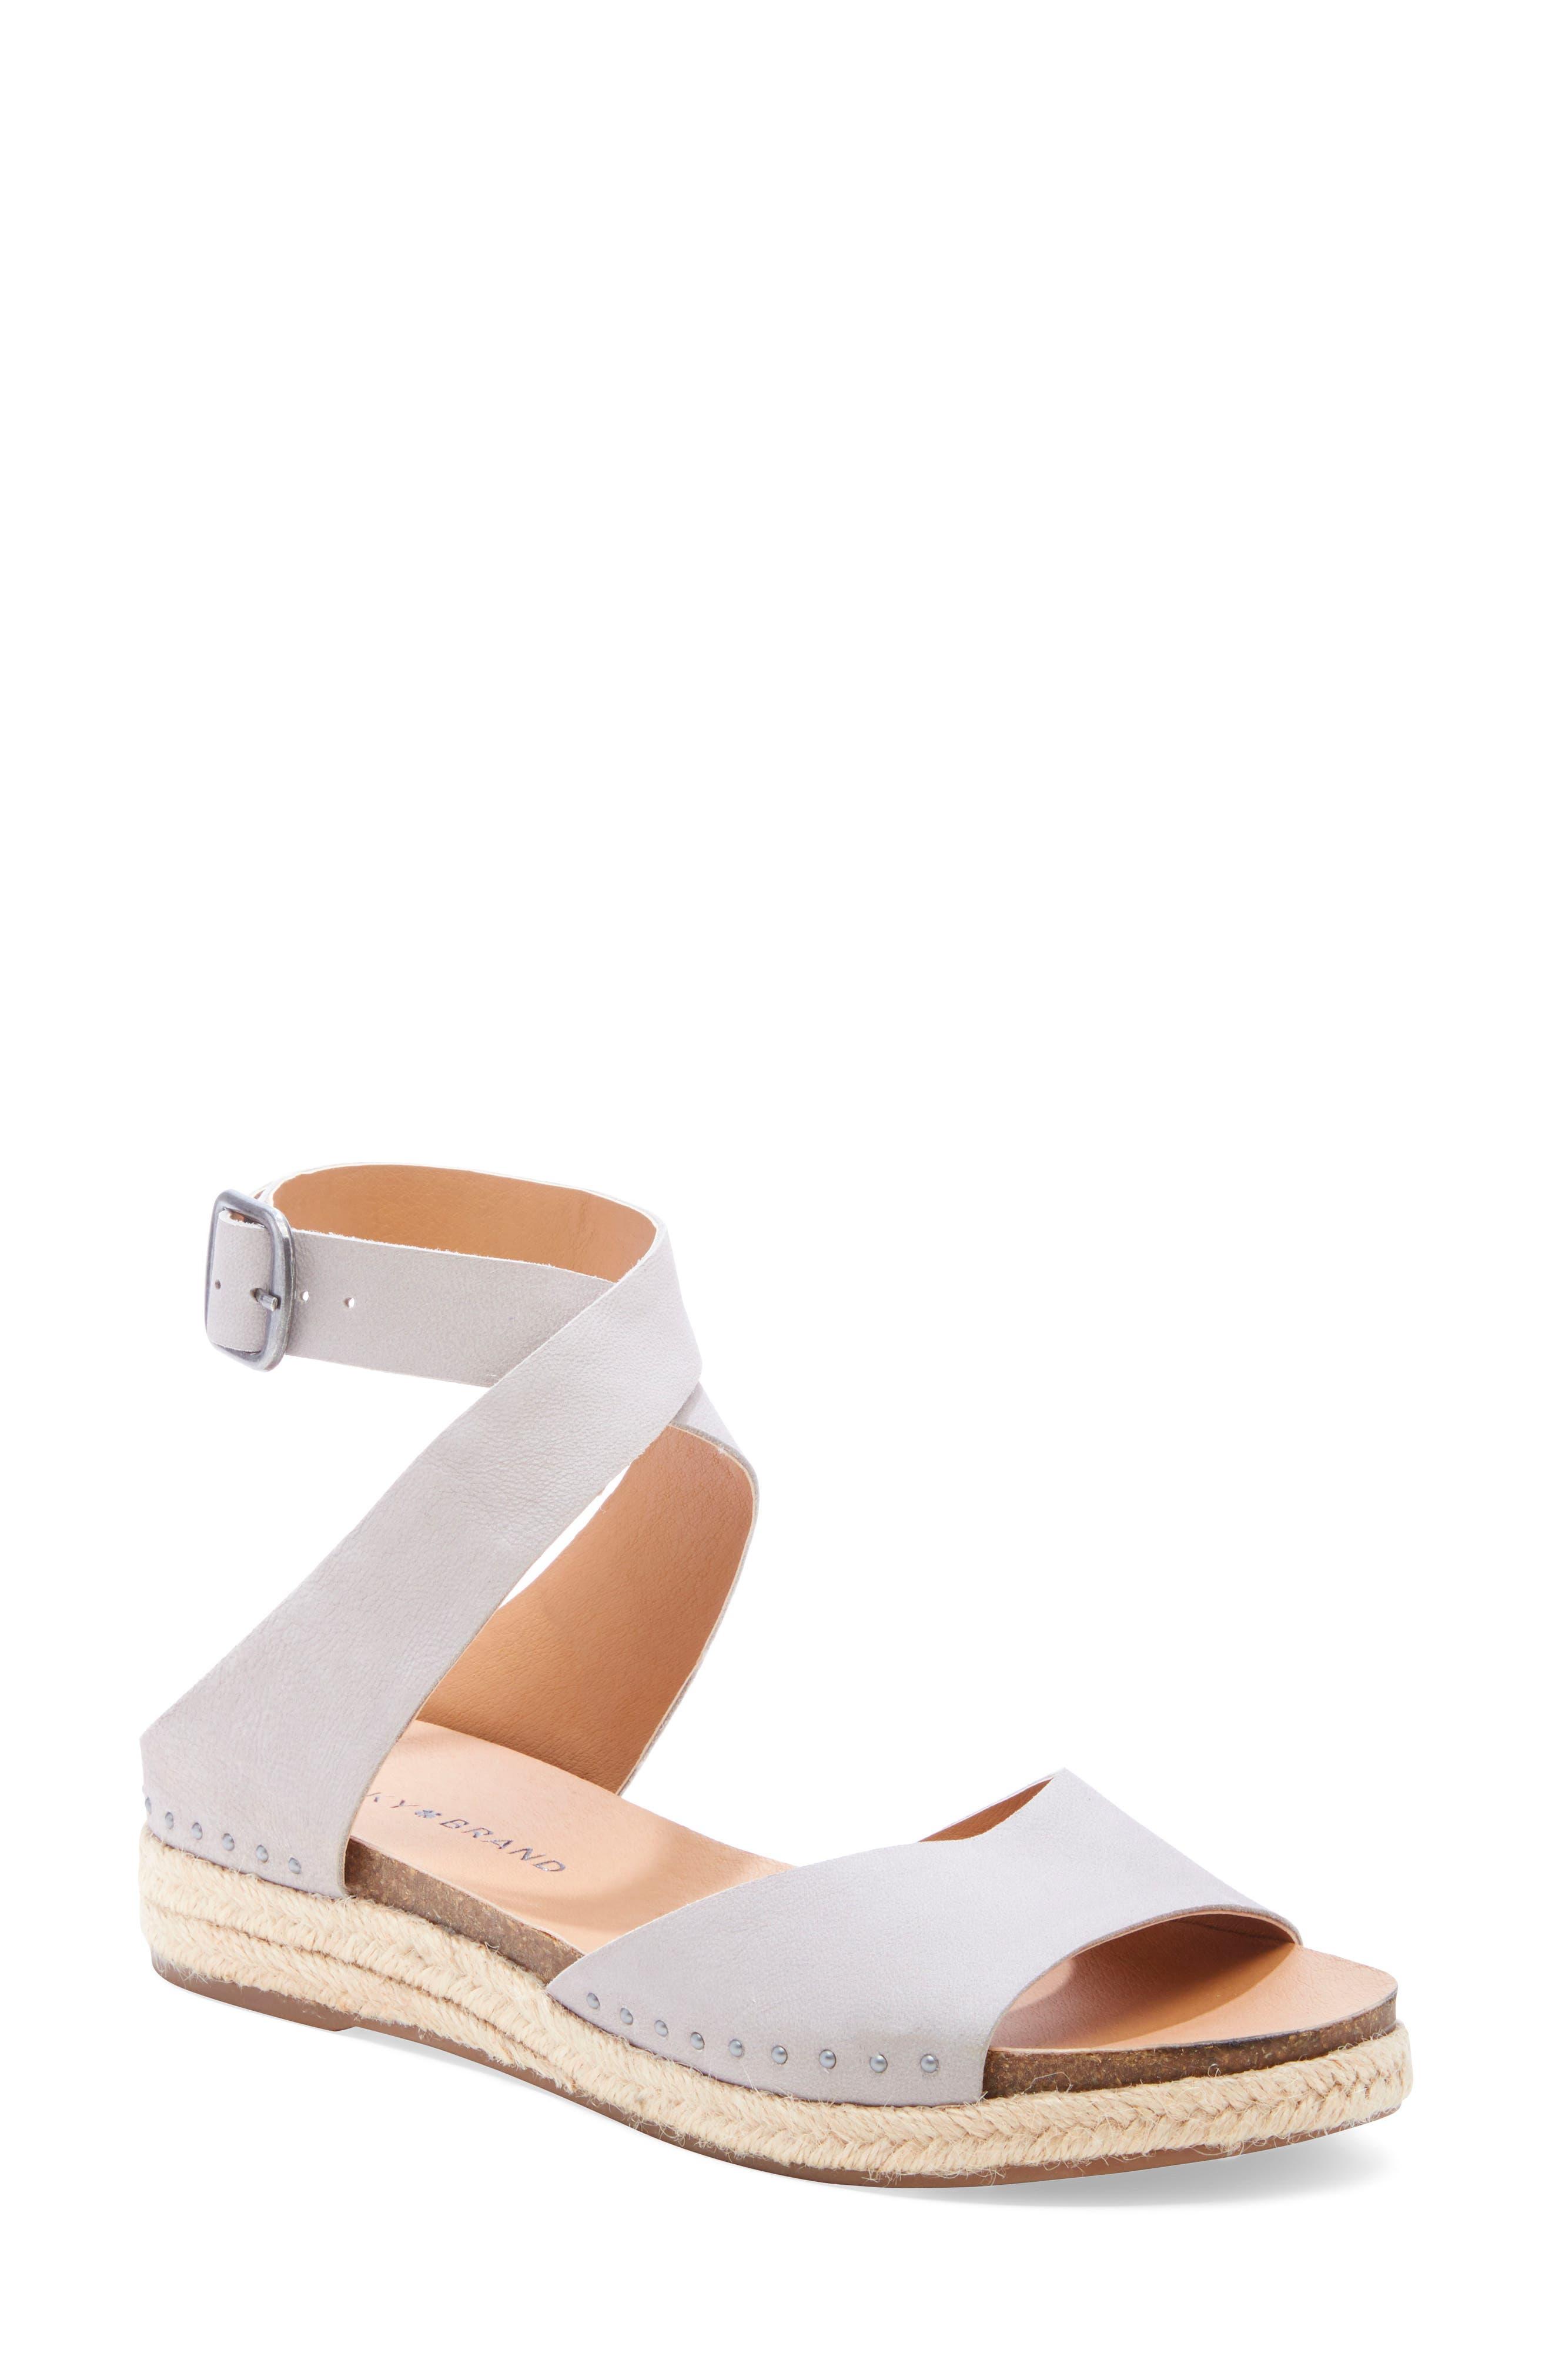 Lucky Brand Gladas Wedge Espadrille Sandal, Grey